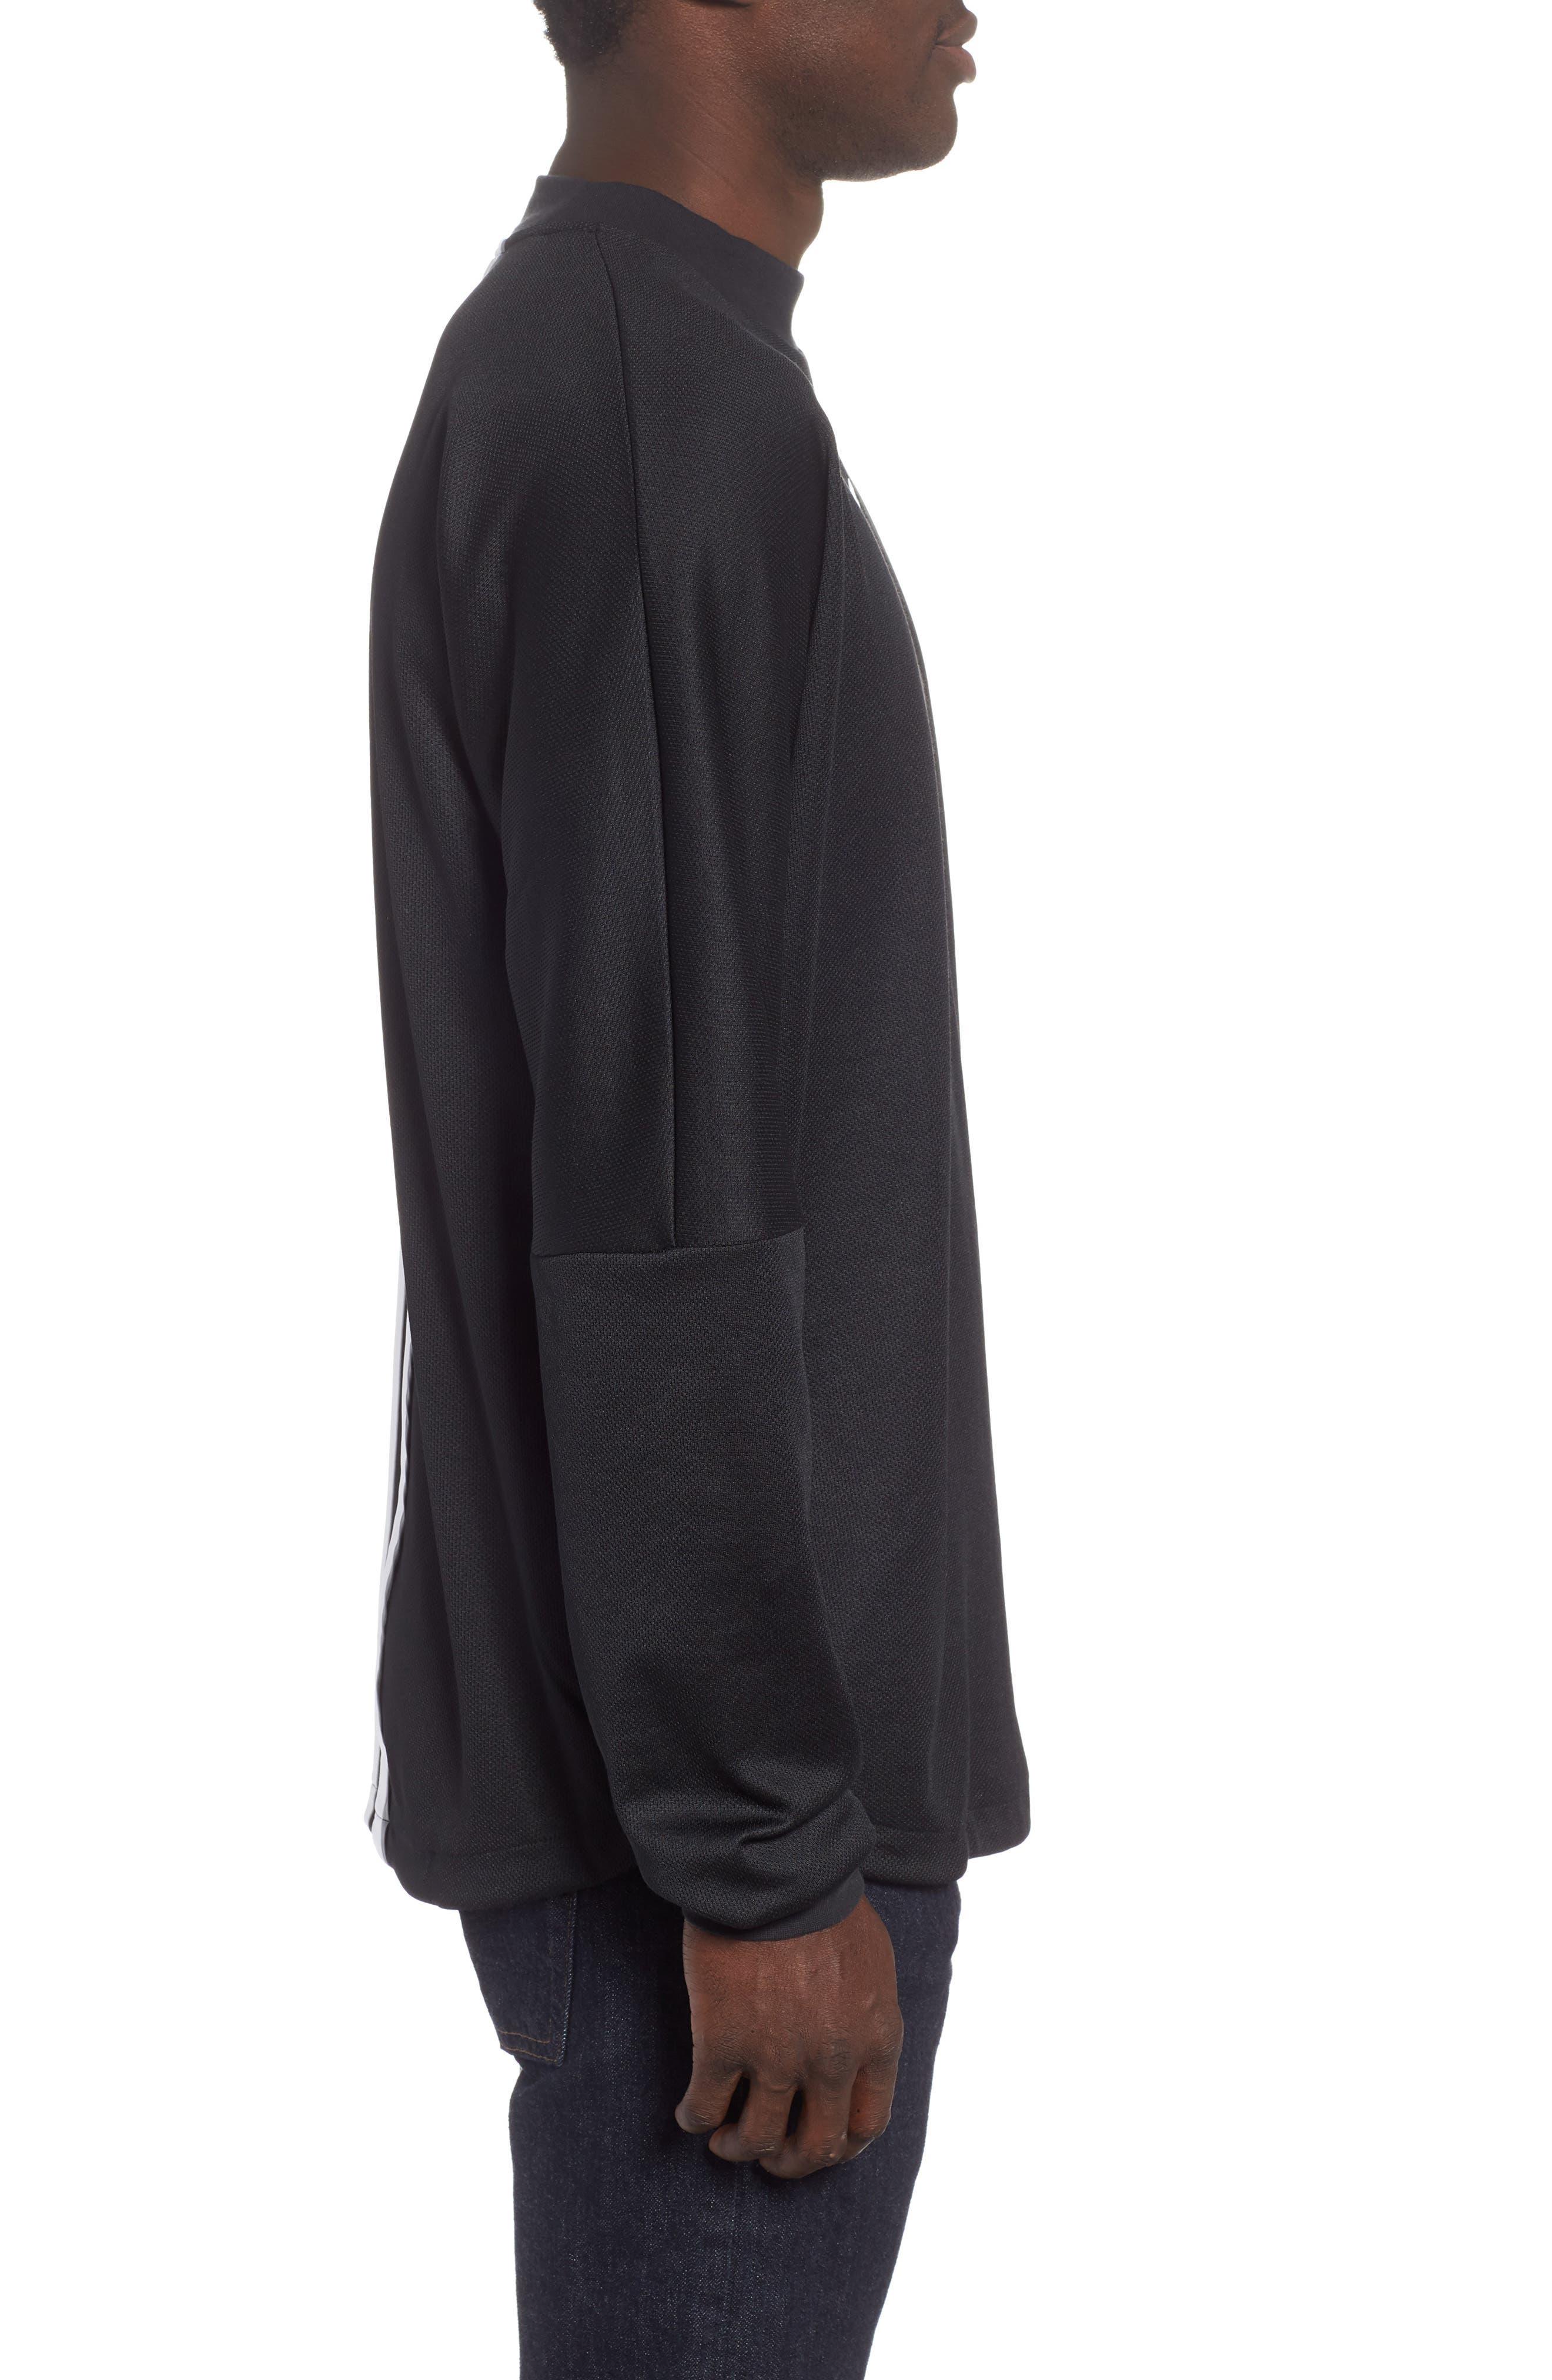 Authentics Long Sleeve Goalie Shirt,                             Alternate thumbnail 3, color,                             BLACK/ WHITE